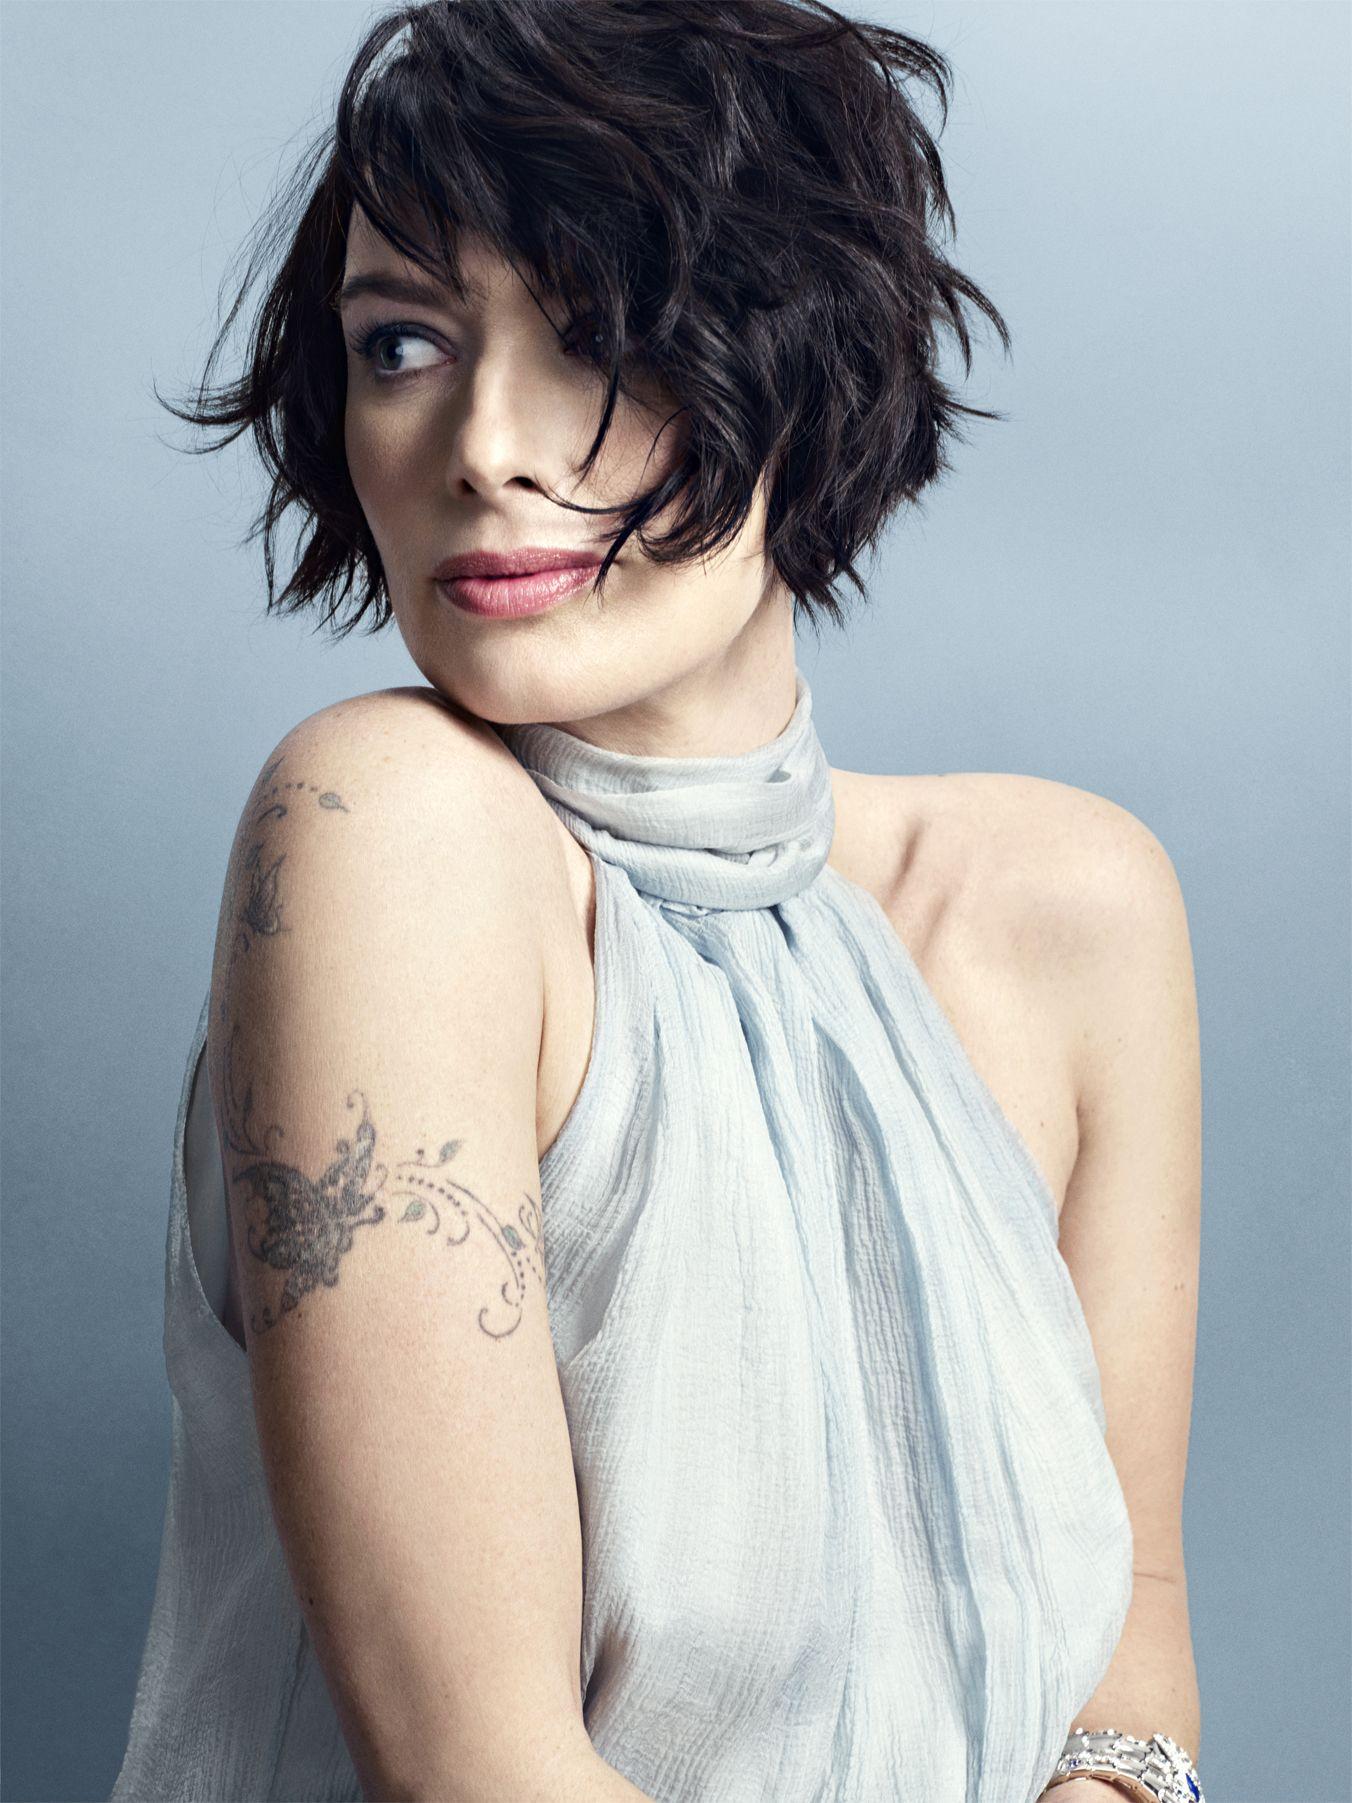 Lena Headey Square Face Hairstyles Short Hair Styles Edgy Hair